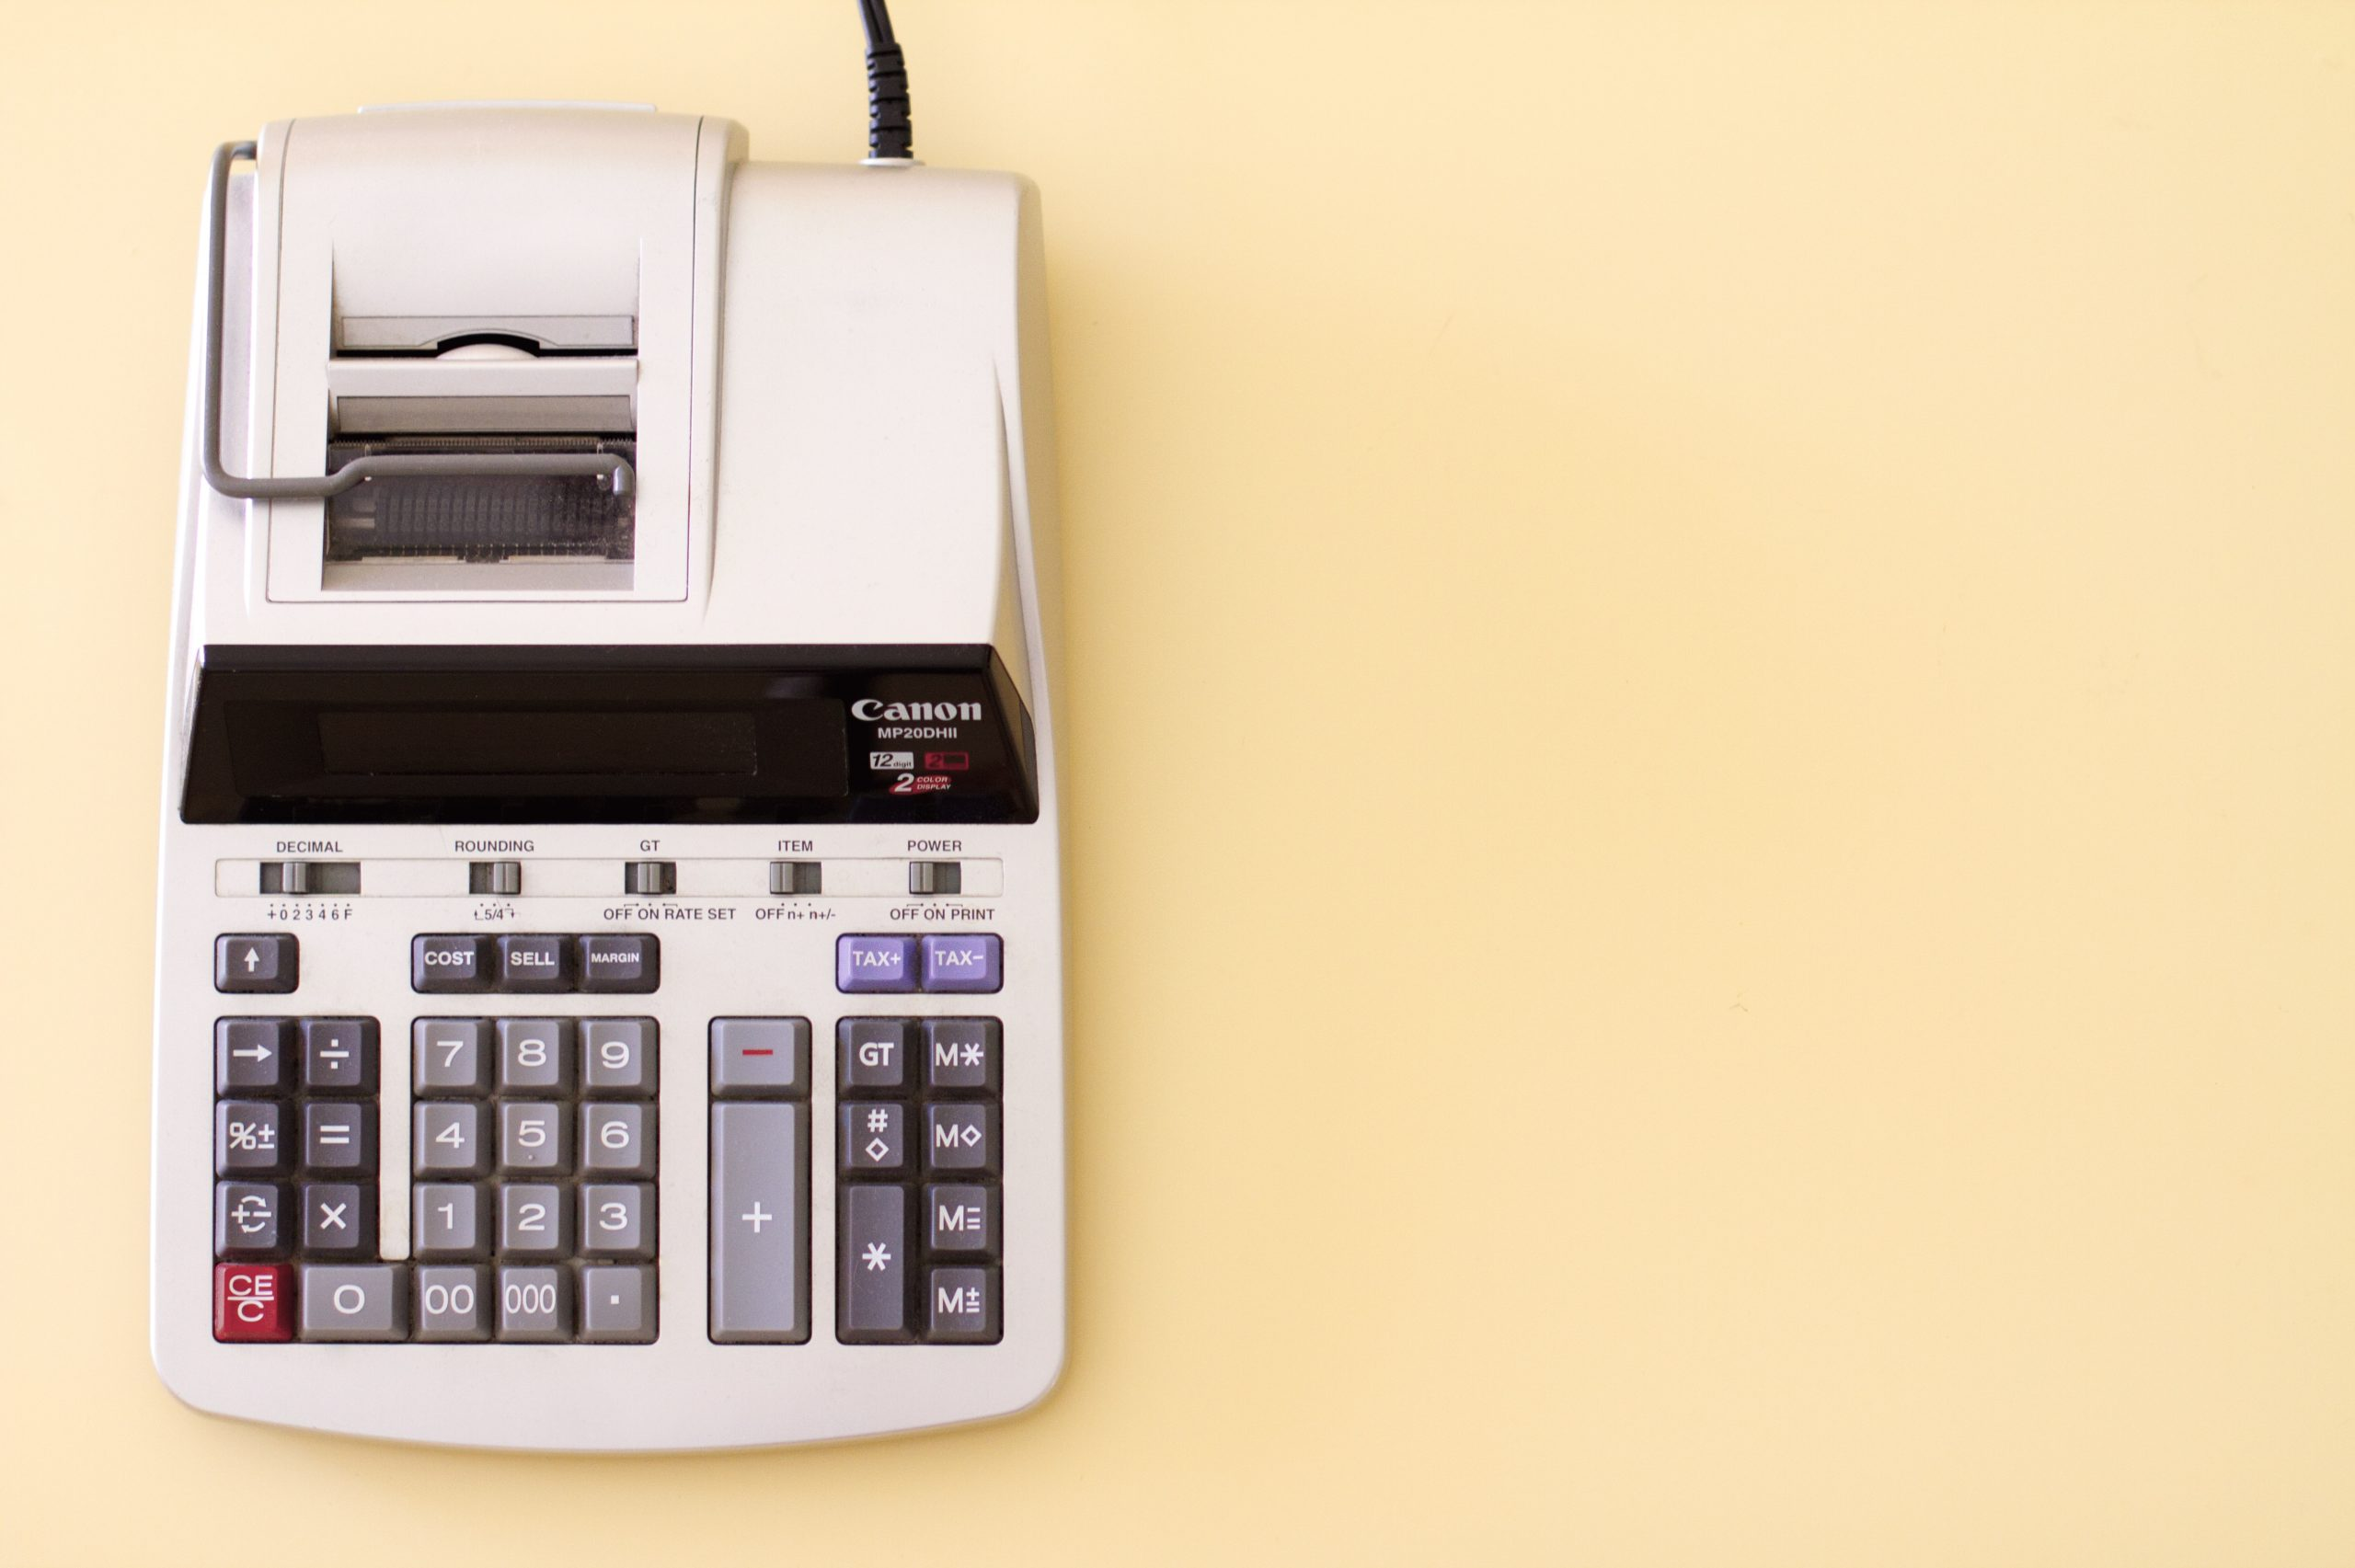 Equity release calculator BBC